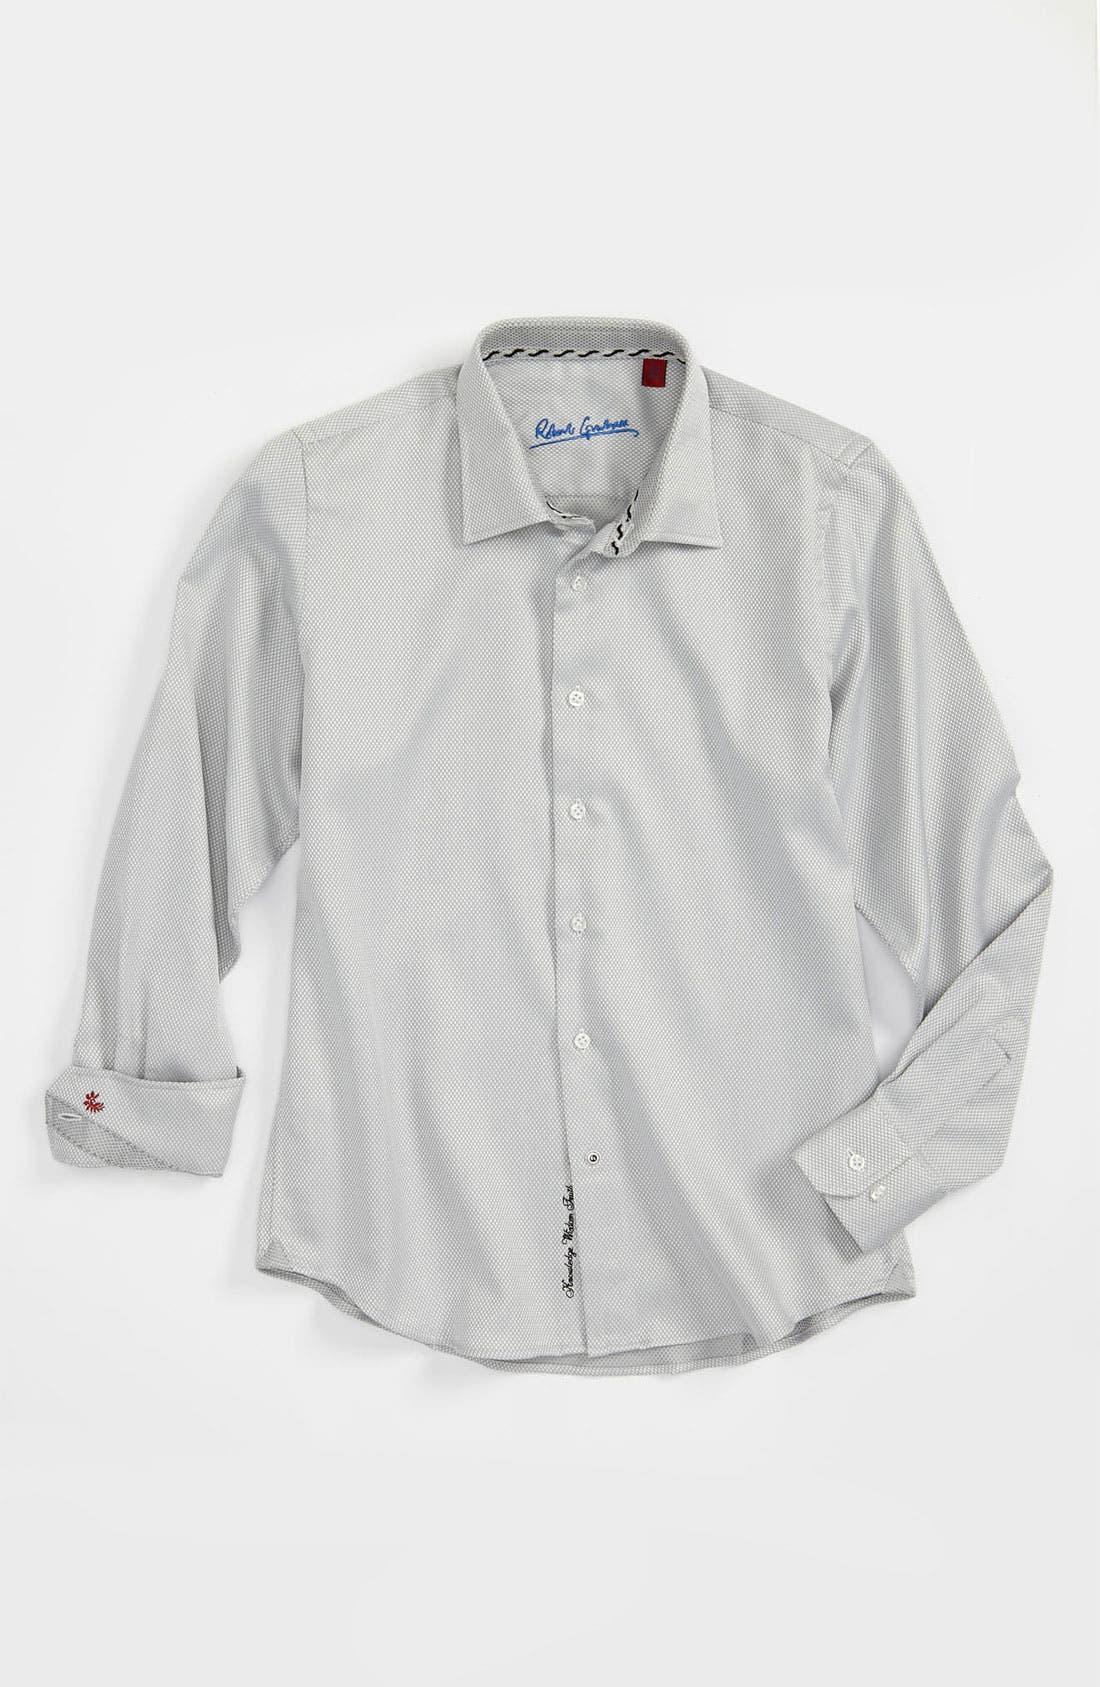 Alternate Image 1 Selected - Robert Graham 'Tommy' Dress Shirt (Big Boys)